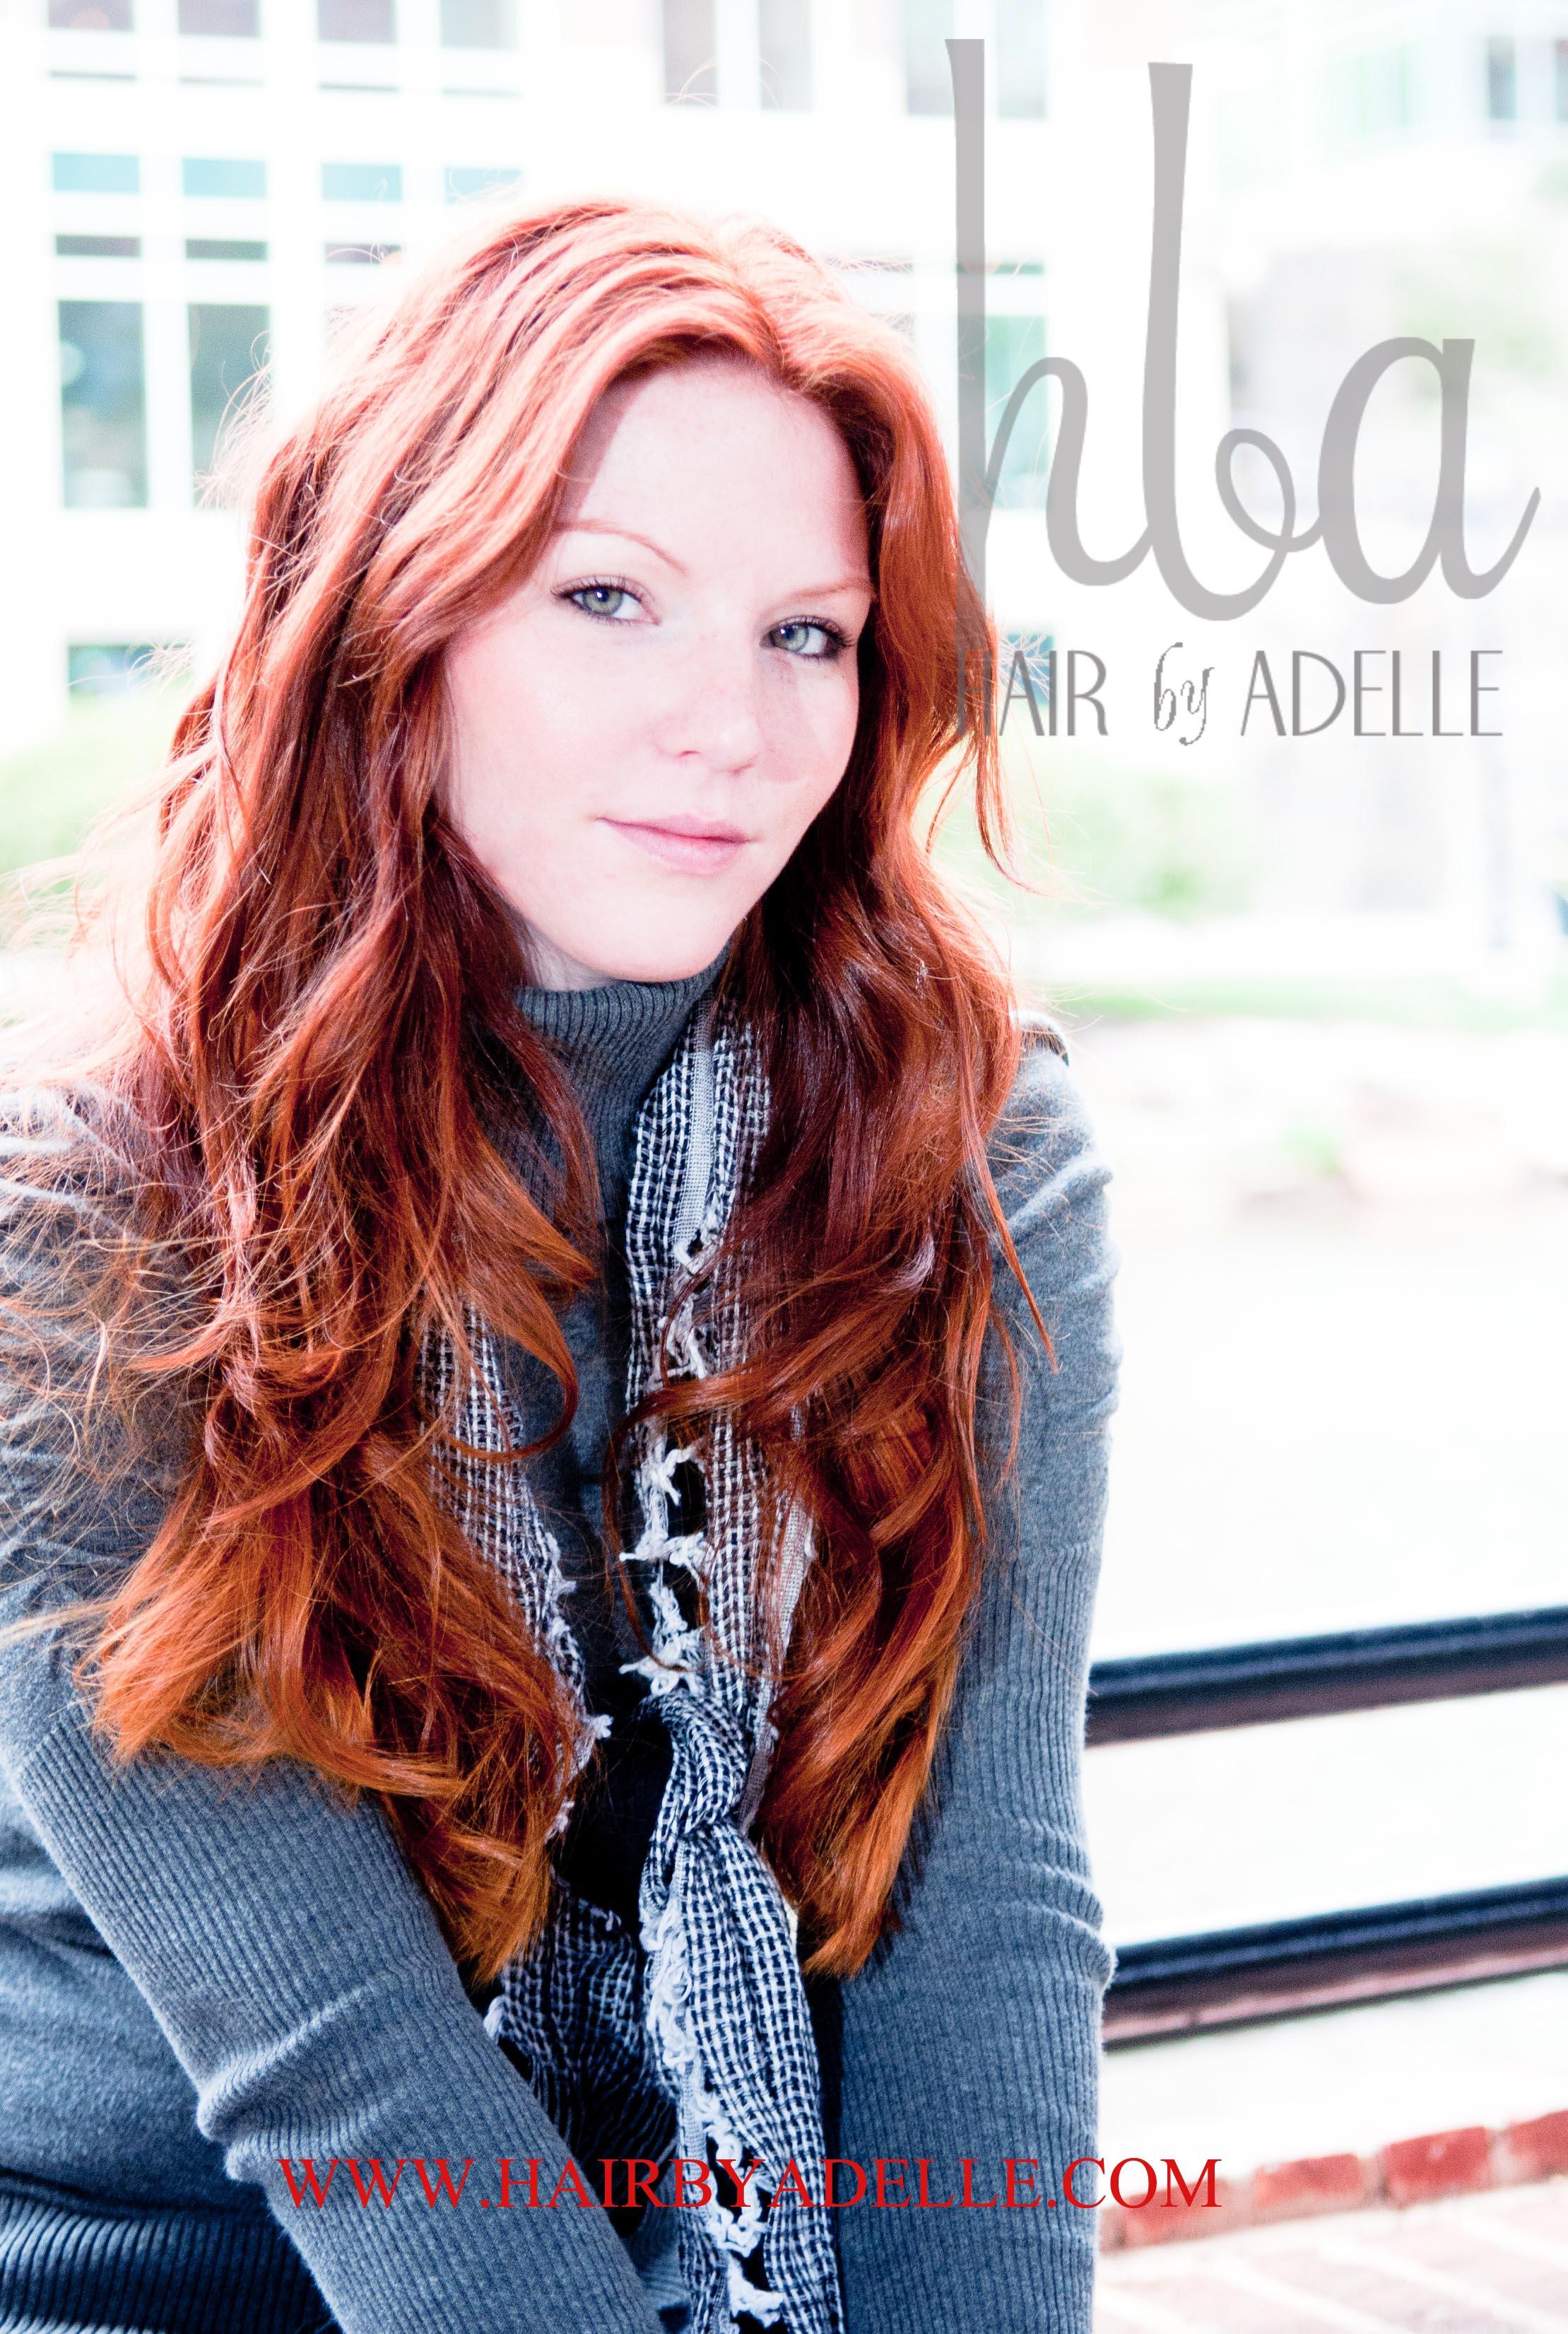 Ombre Hair Color In Greenville Sc Salon Adelle